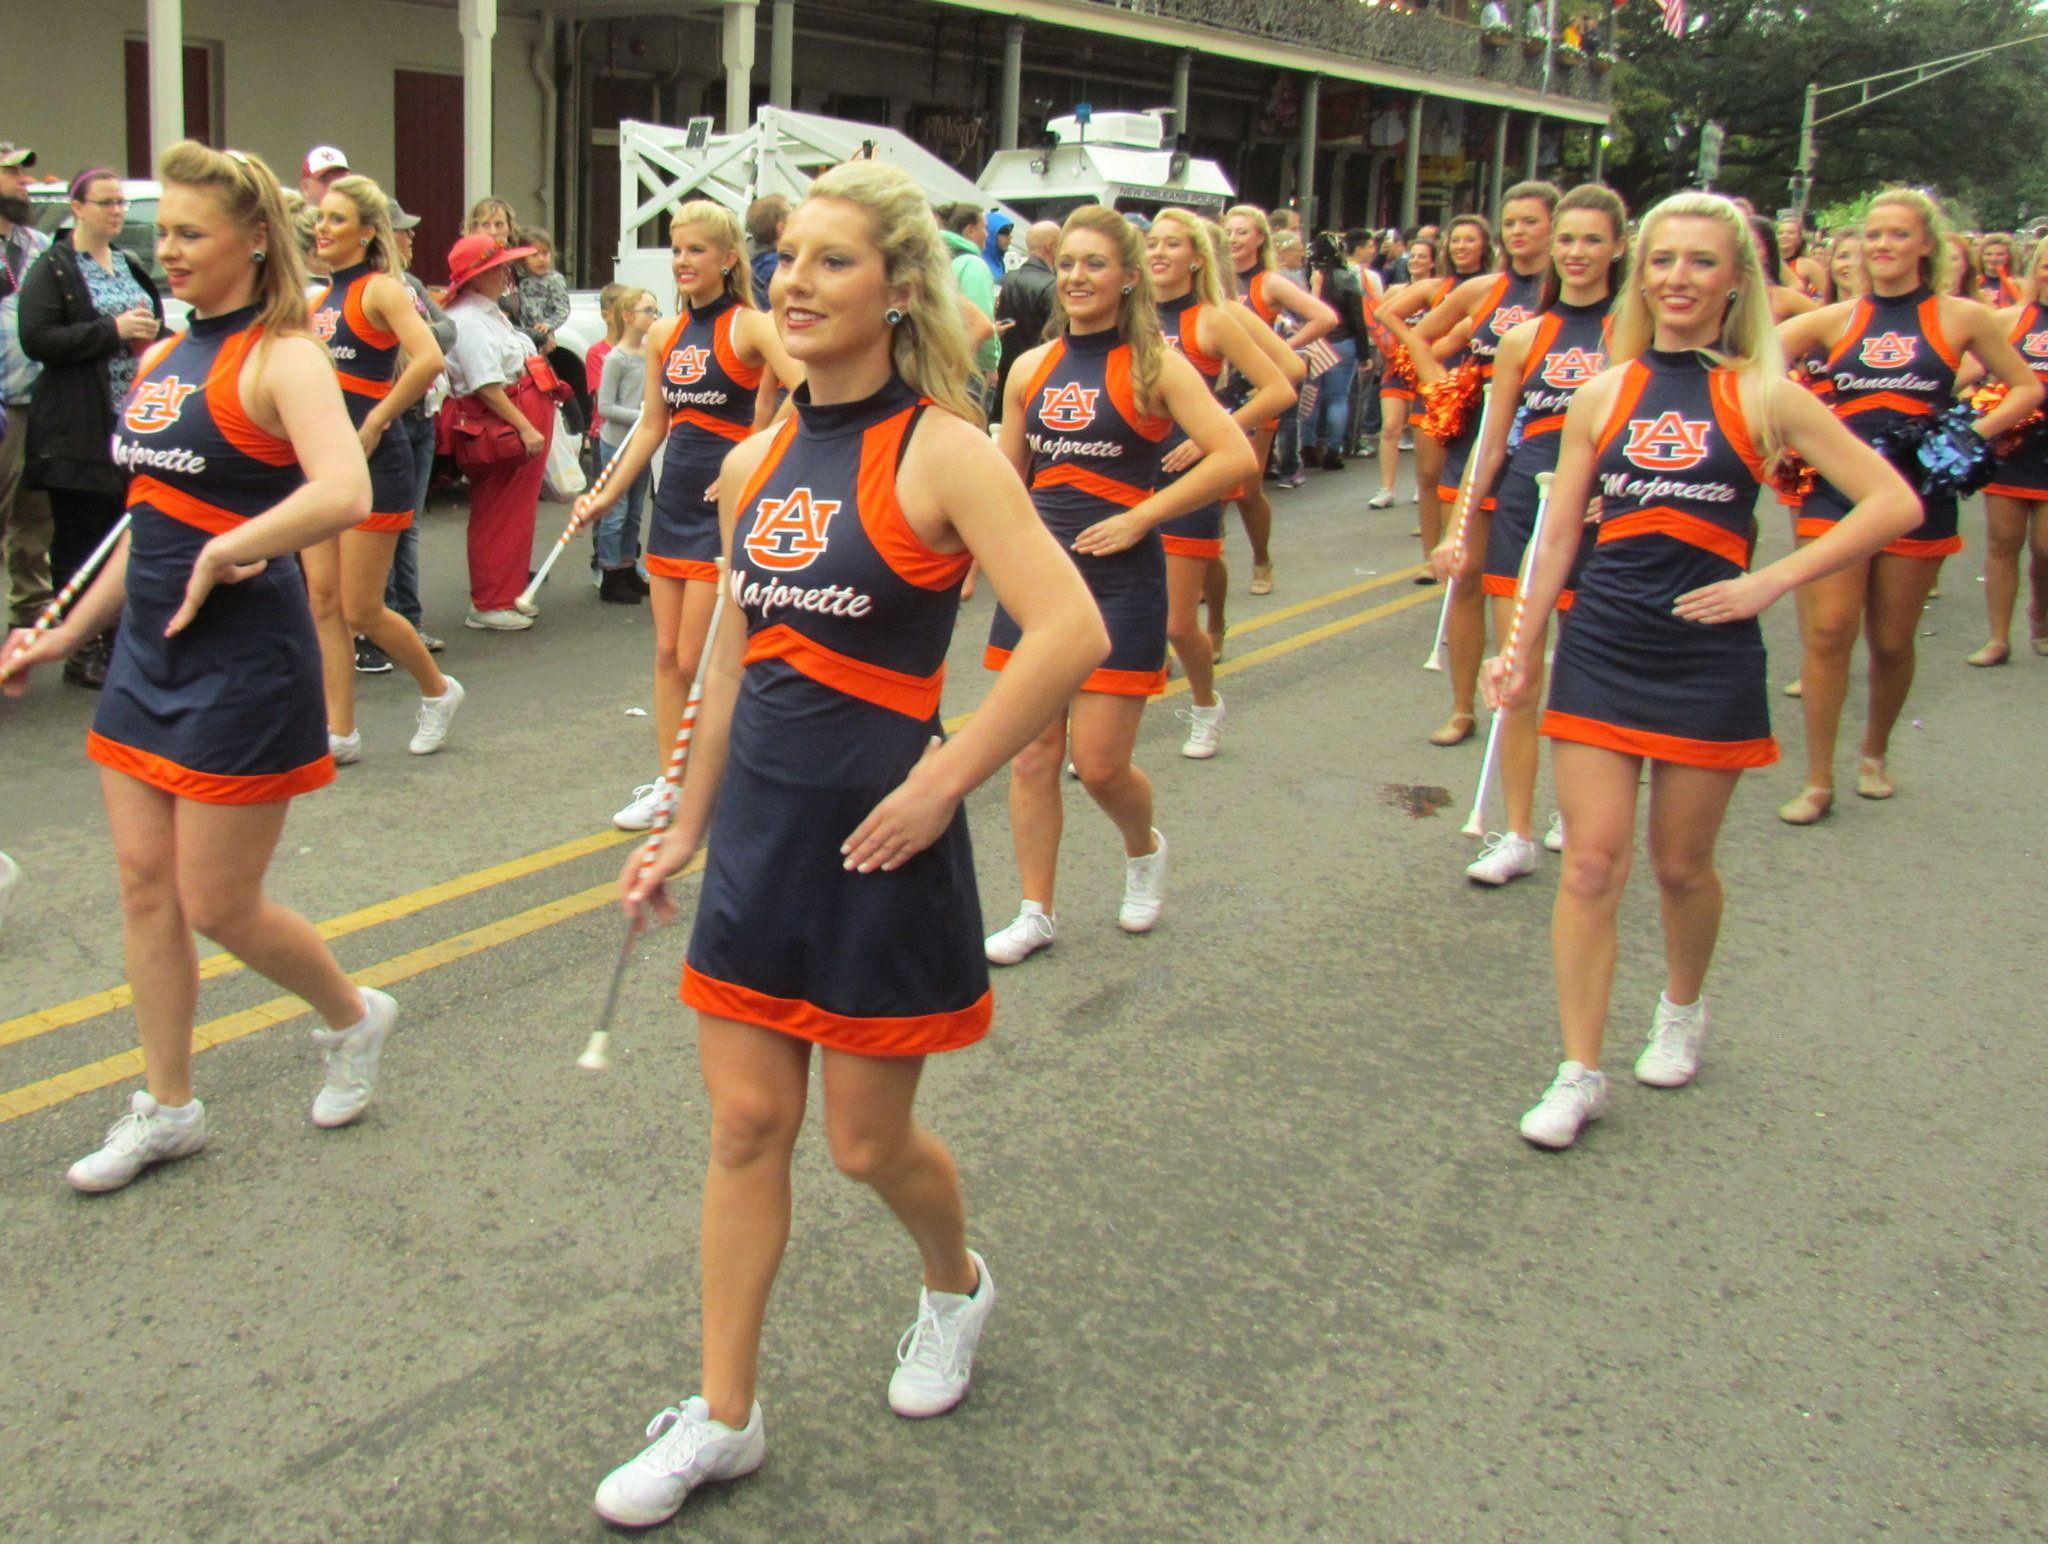 Sugar bowl parade gives auburn fans taste of mardi gras